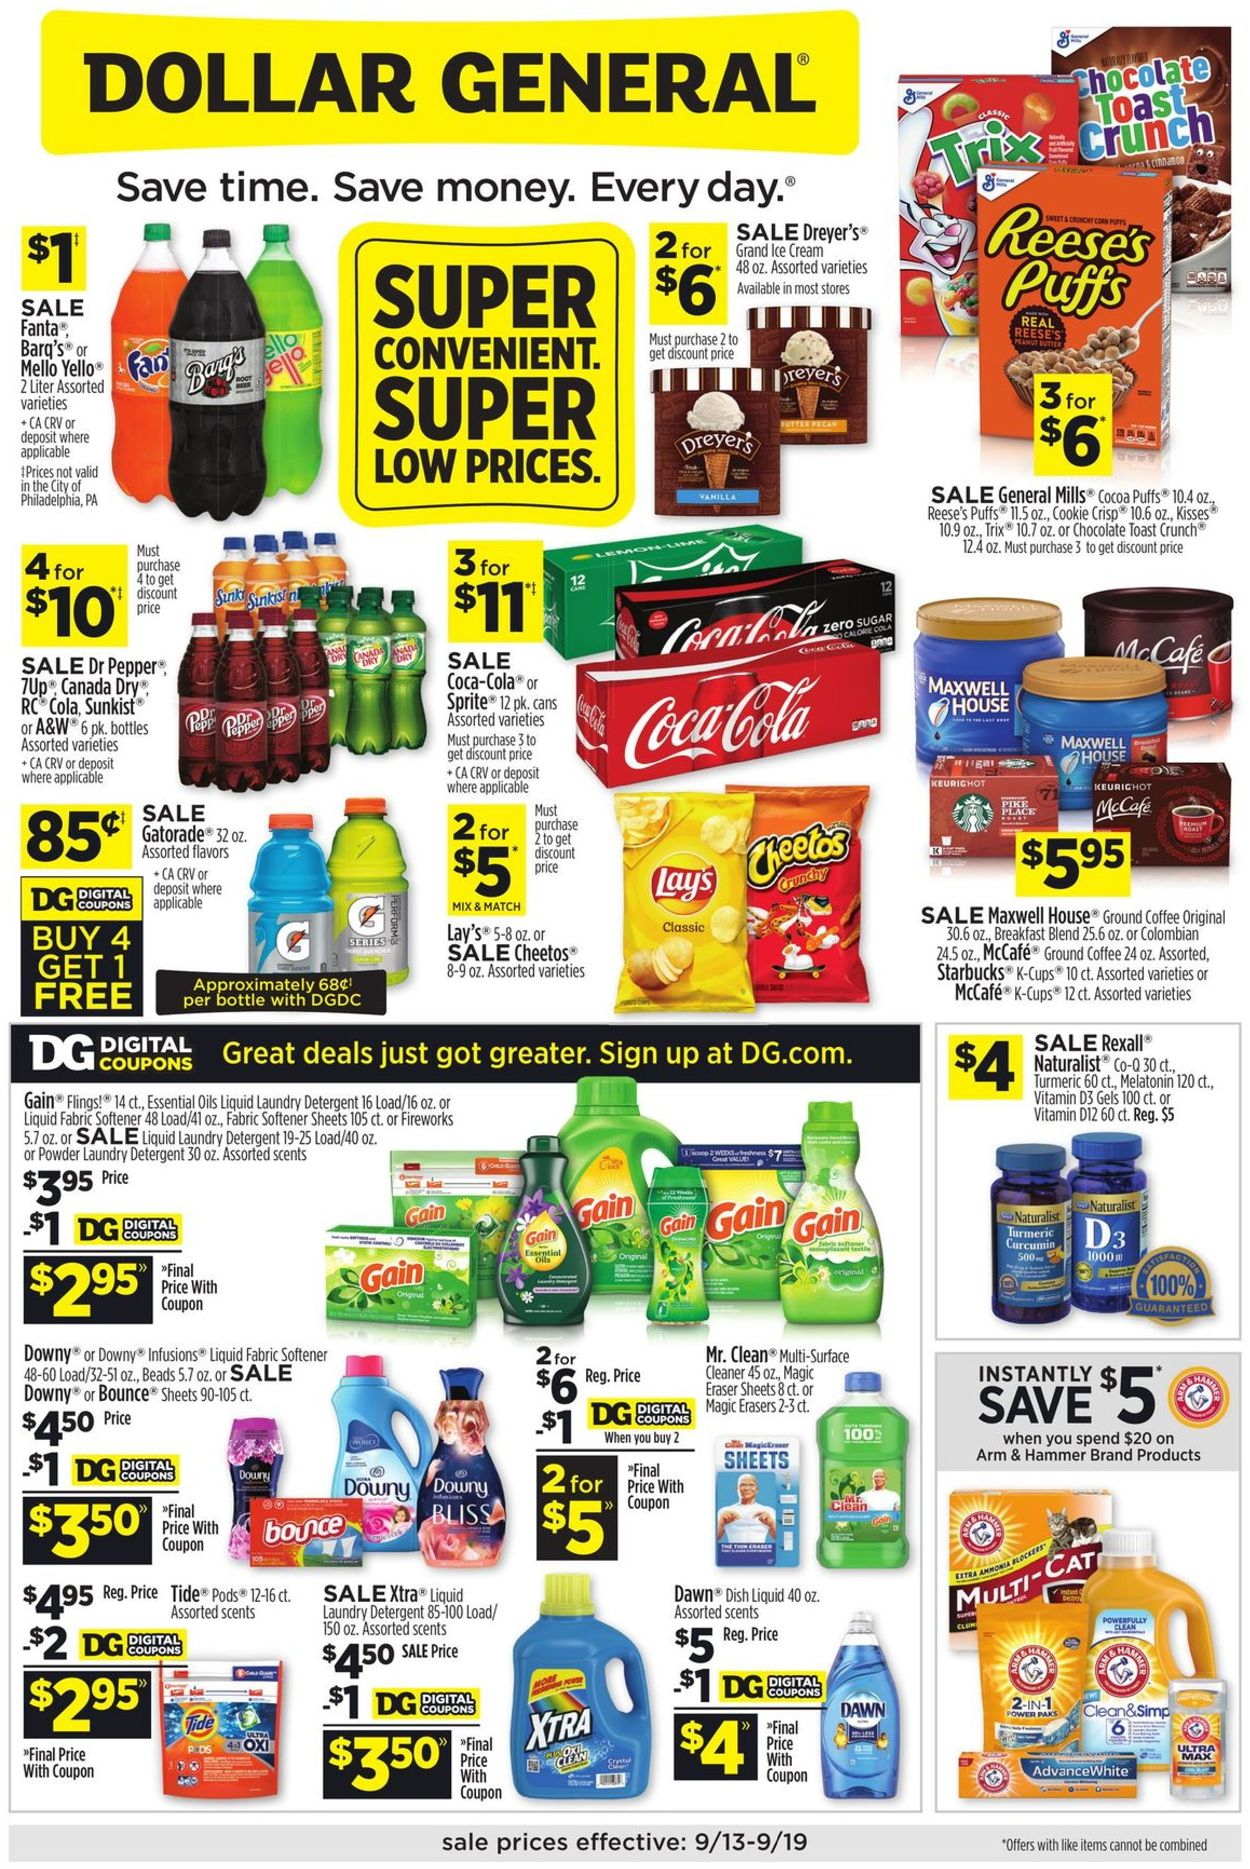 Dollar General Weekly Ad Circular - valid 09/13-09/19/2020